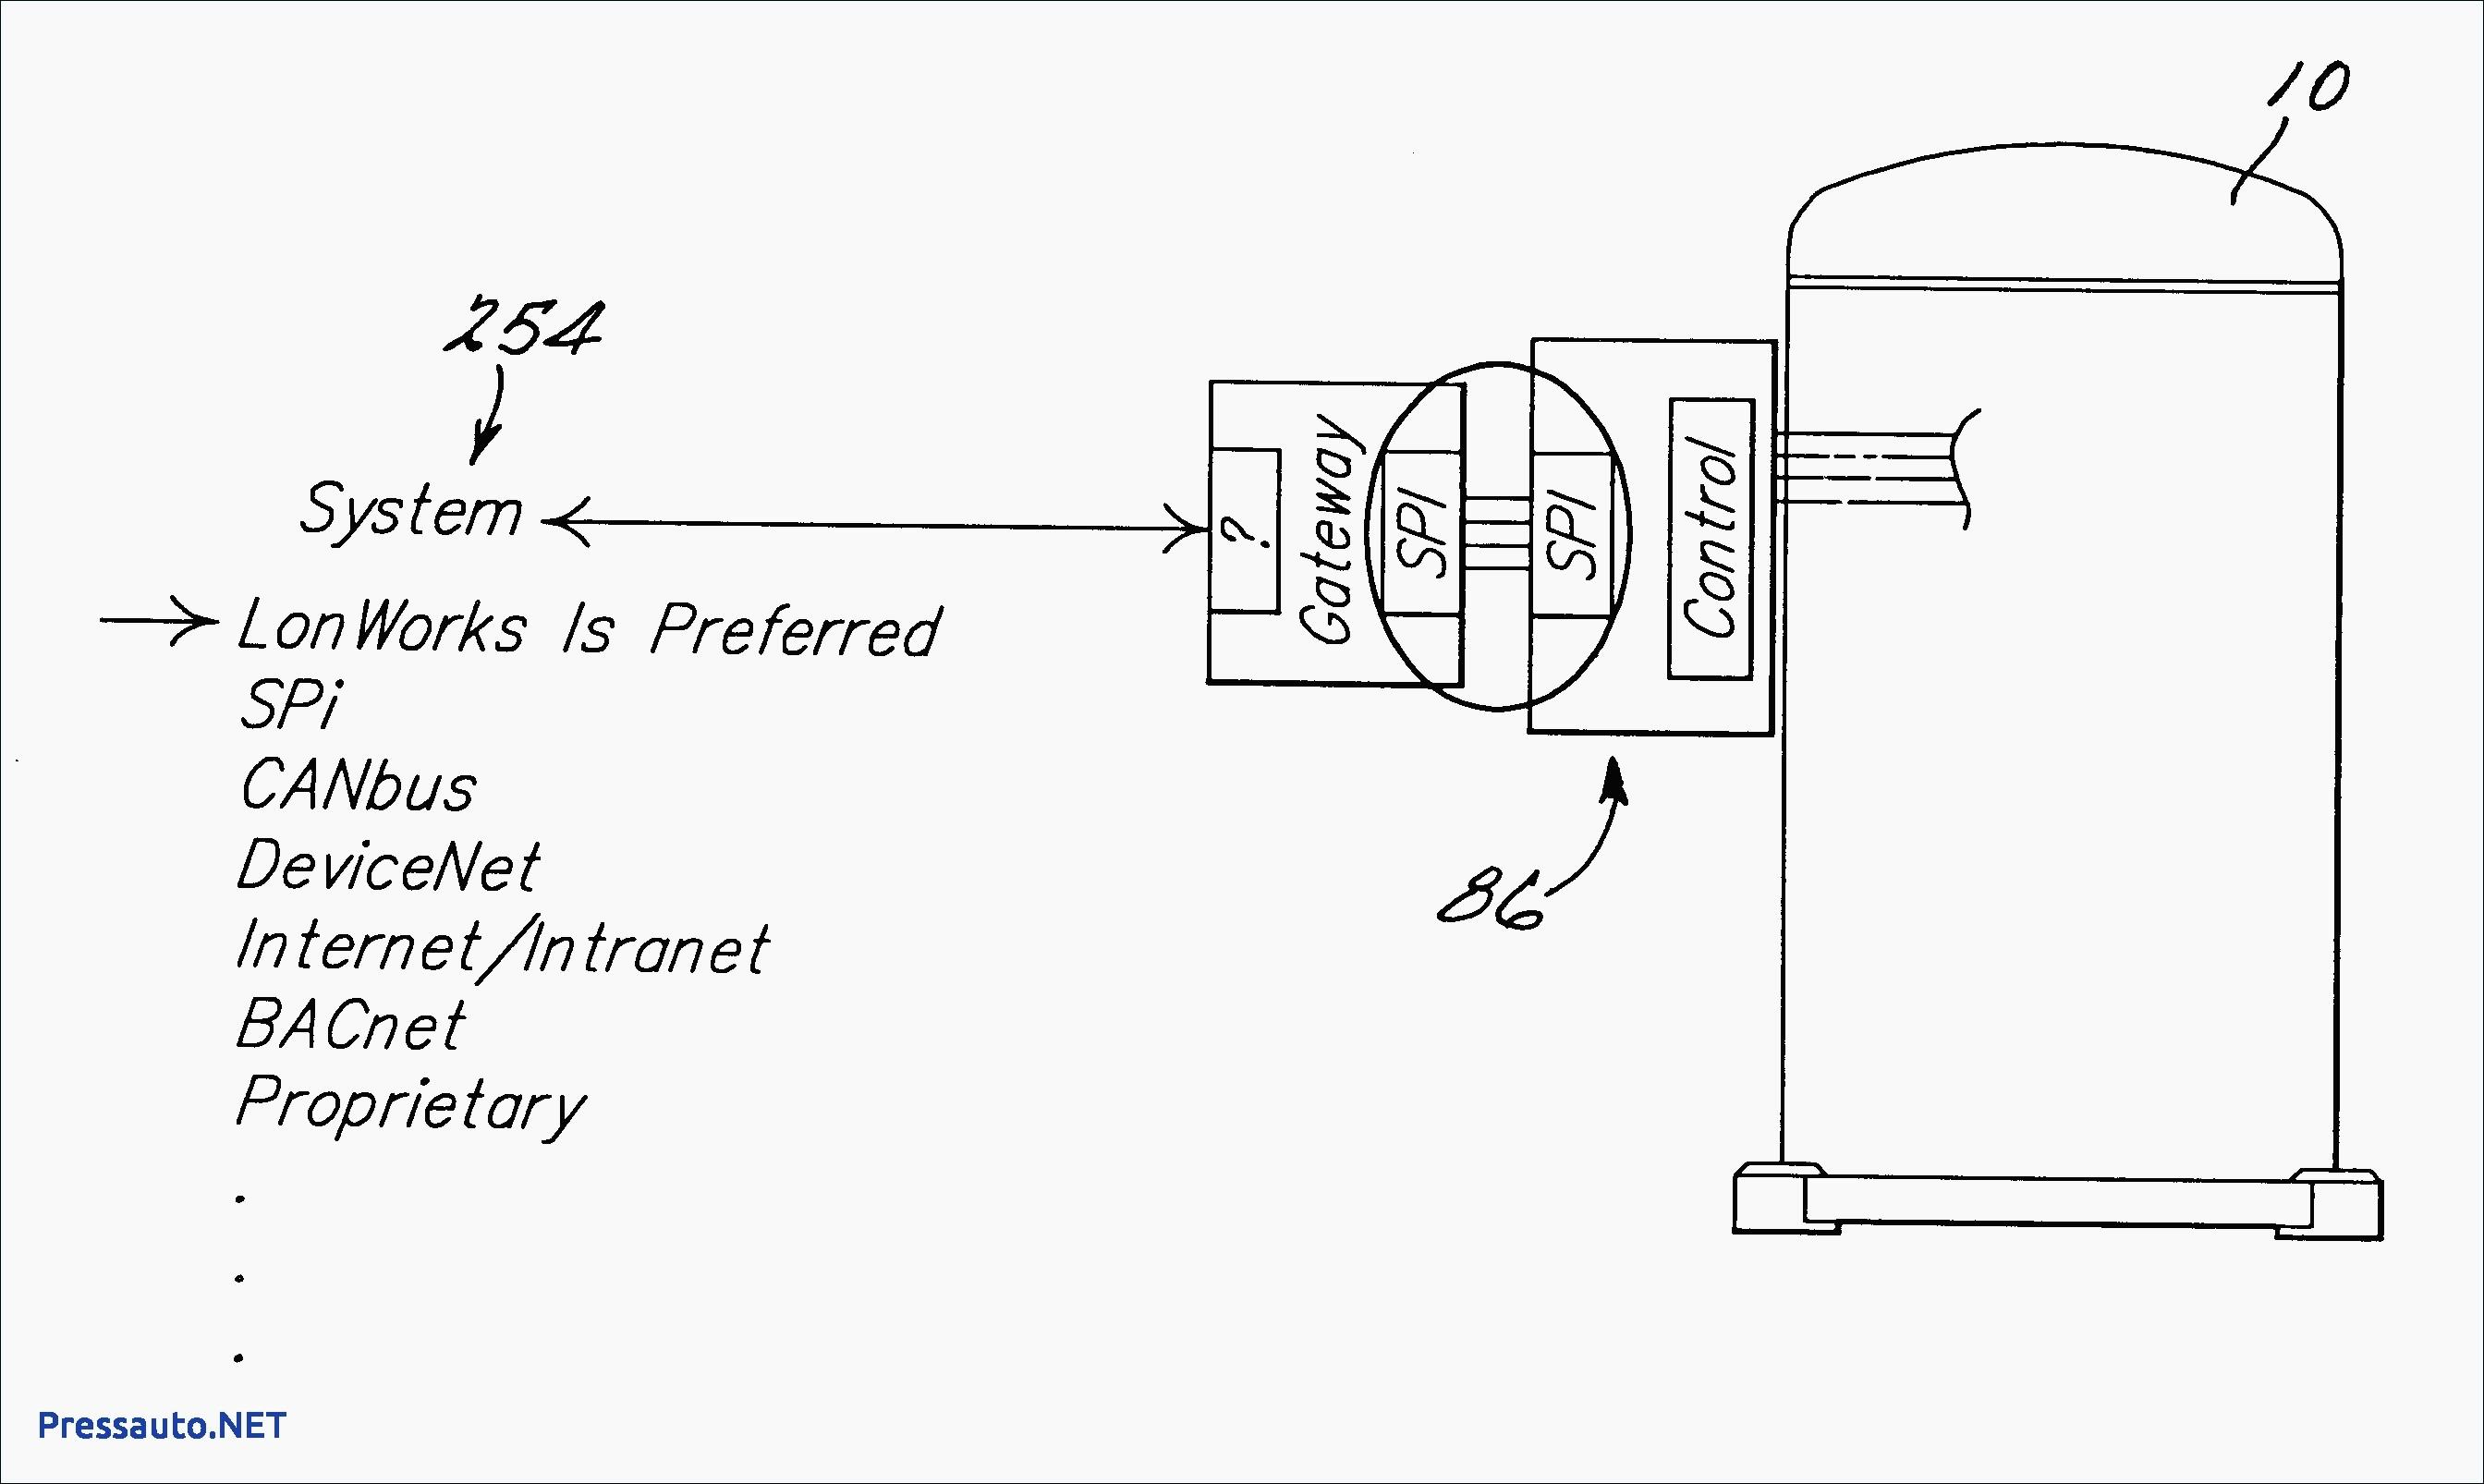 12 Volt Cigarette Lighter Plug Wiring Diagram from detoxicrecenze.com